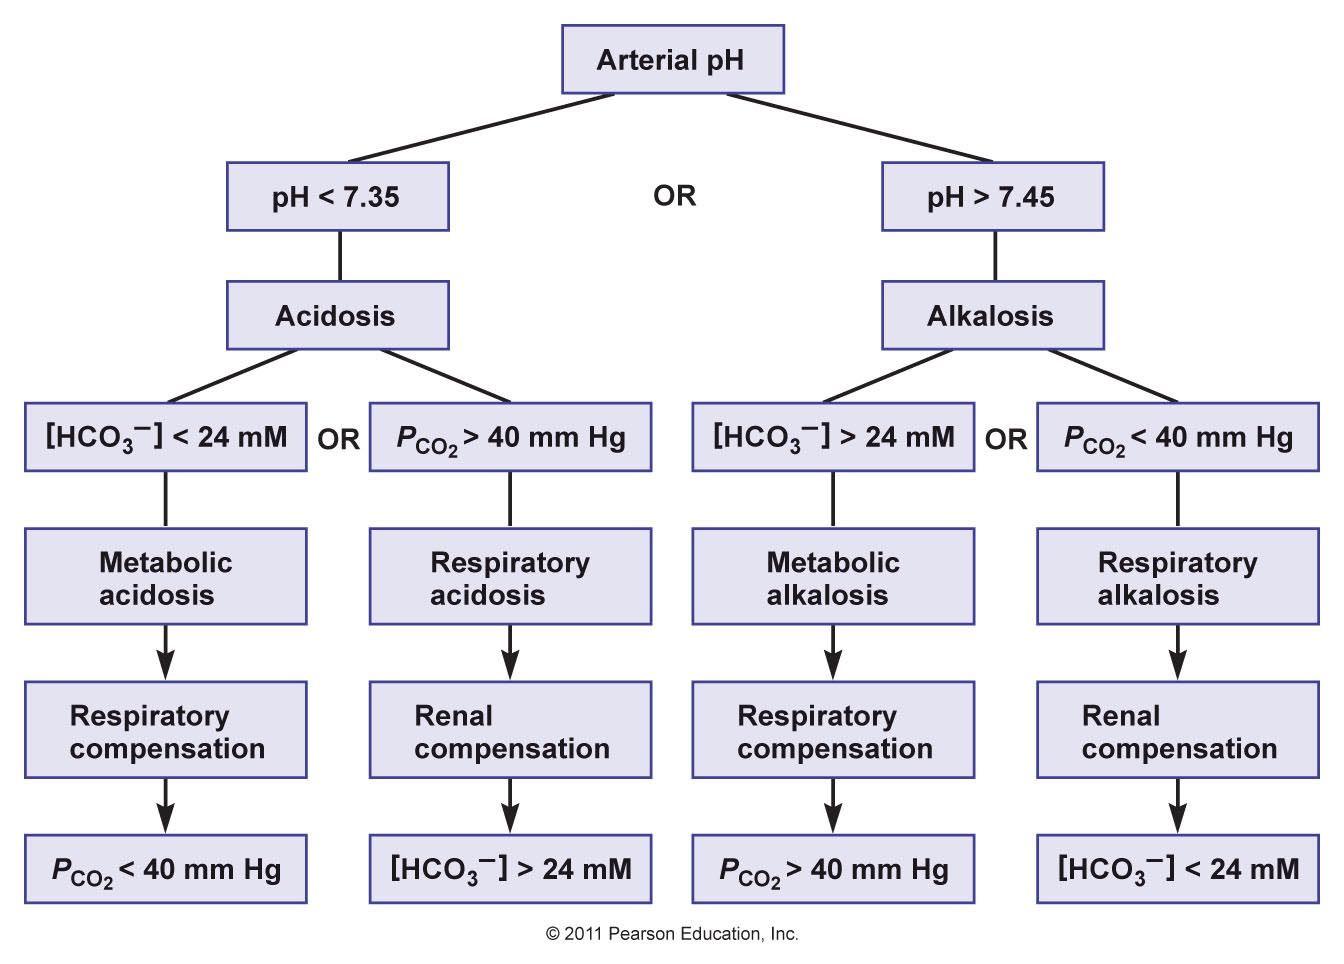 medium resolution of acid base balance evaluation of acid base disturbances diagnosis of acid base